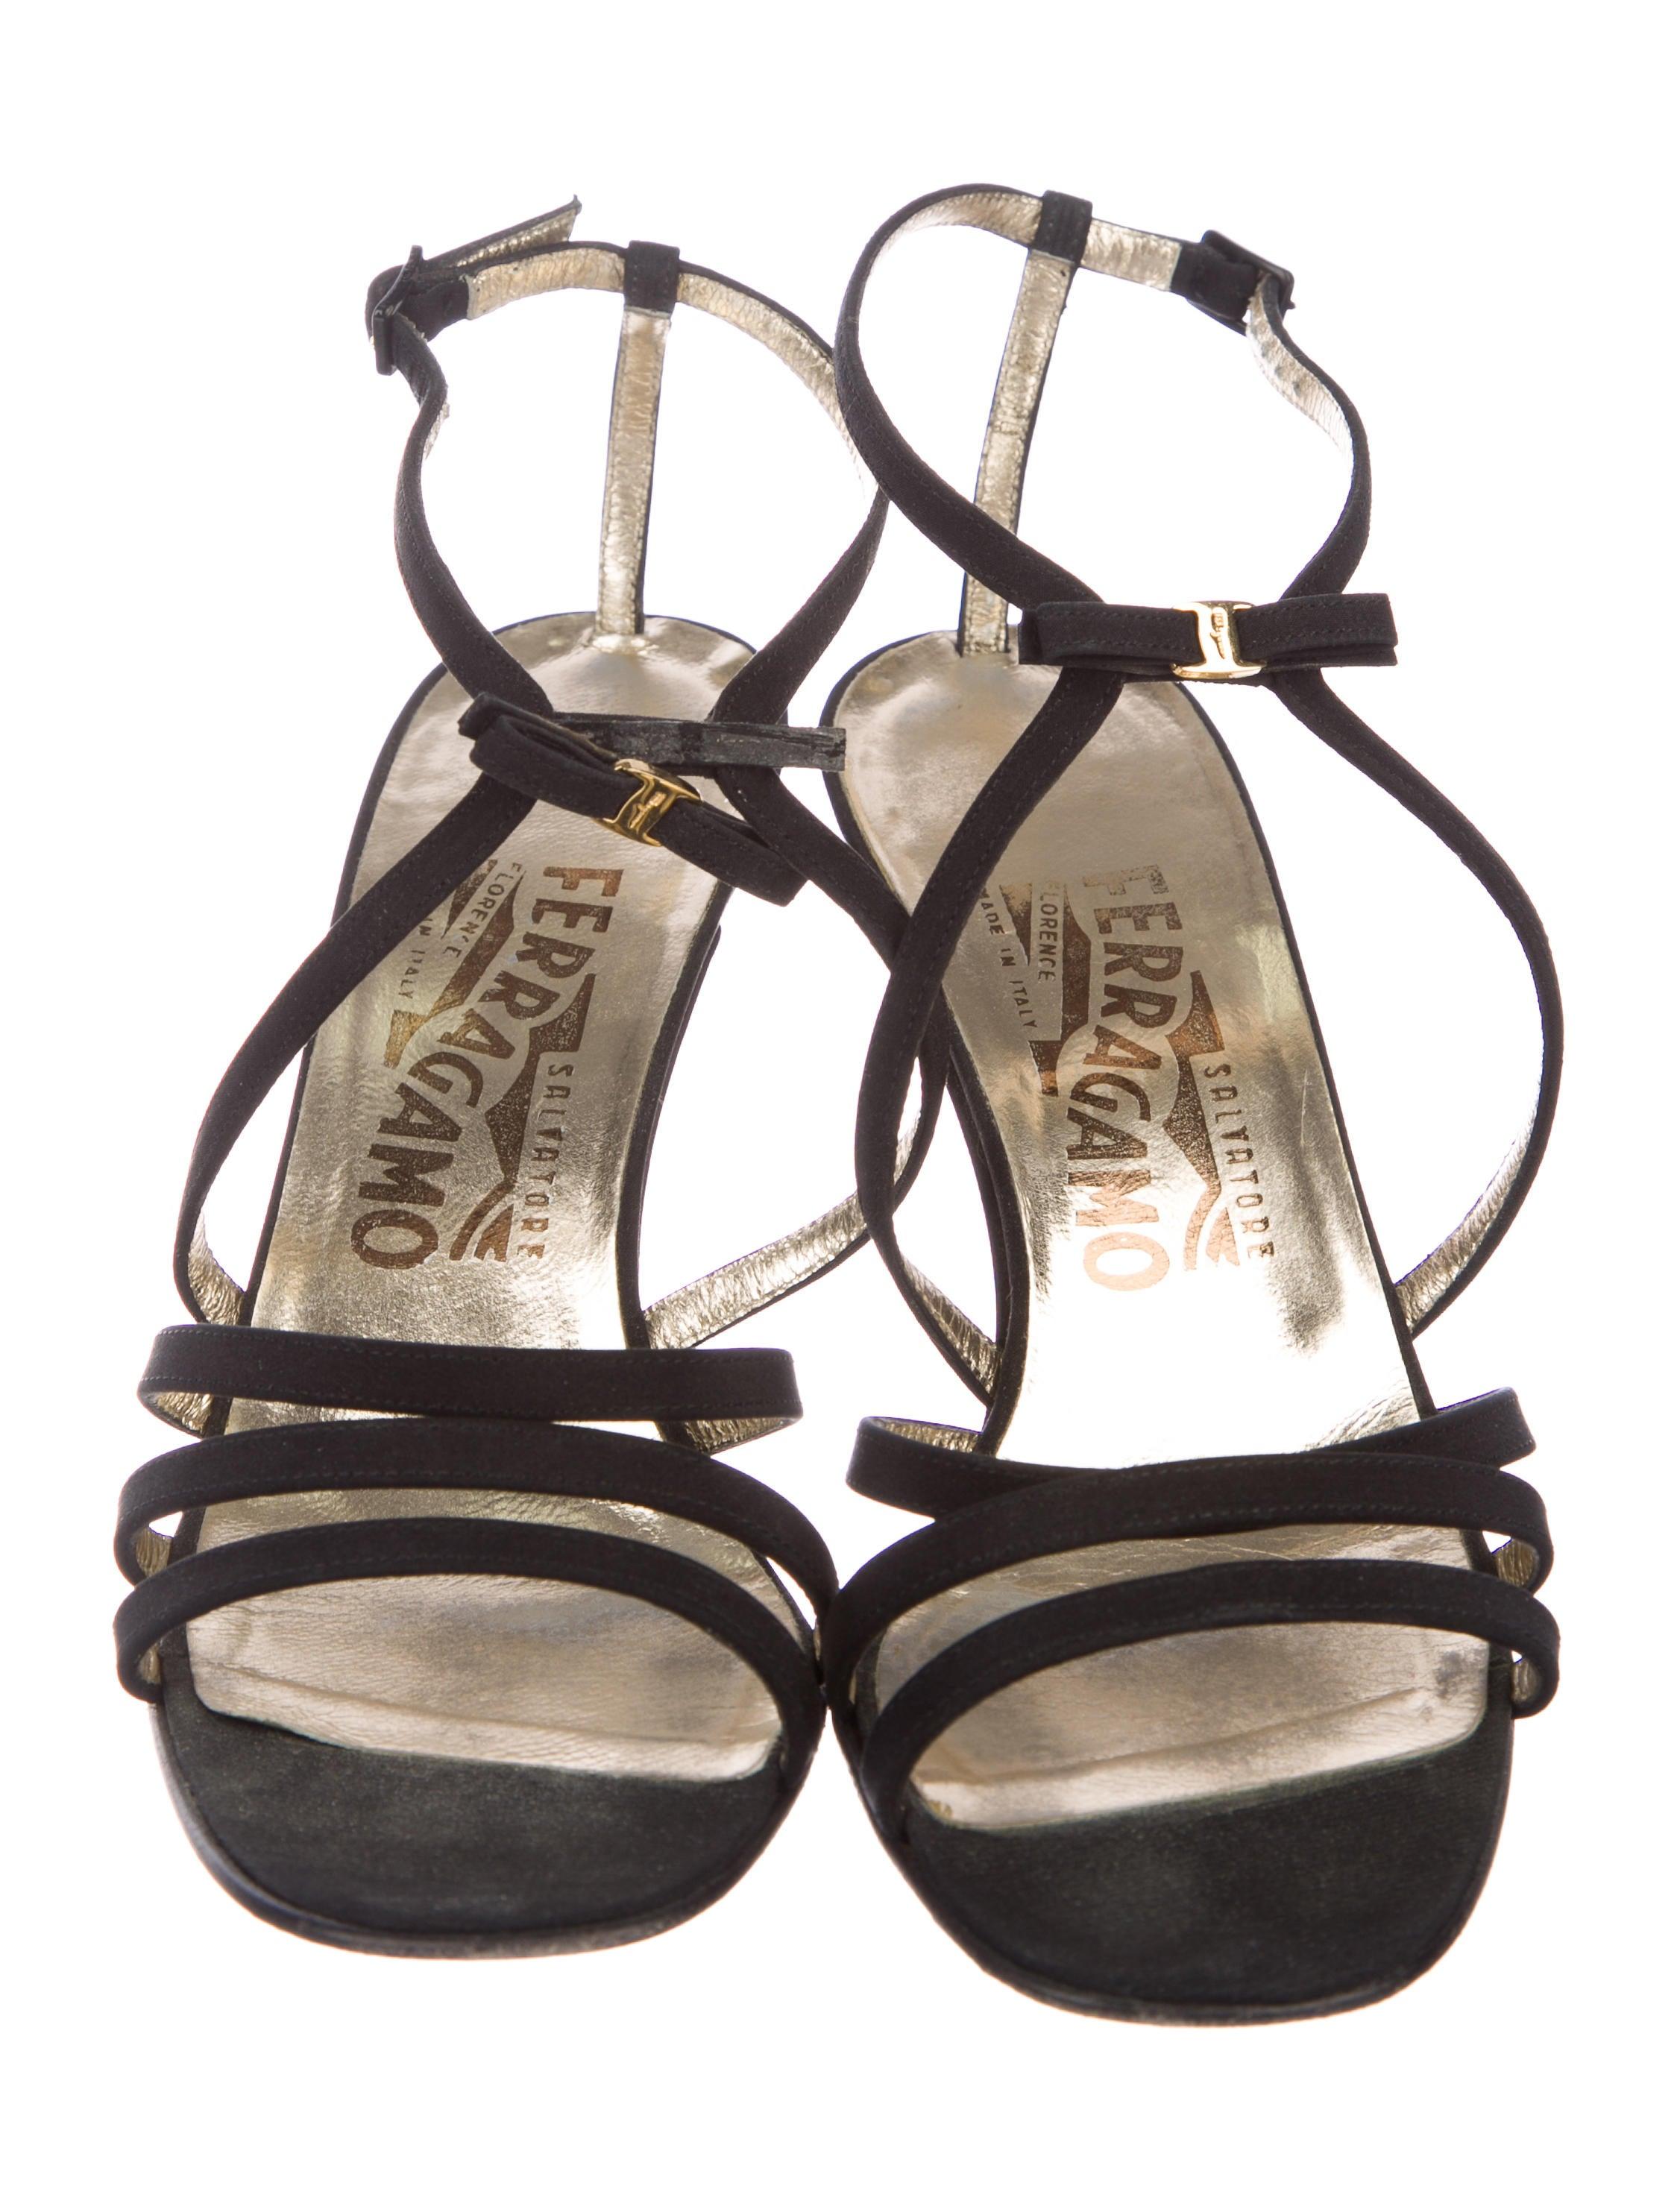 perfect sale online exclusive Salvatore Ferragamo Luigia Multistrap Sandals cheap manchester great sale 2014 new shopping online high quality DvpDBhPL